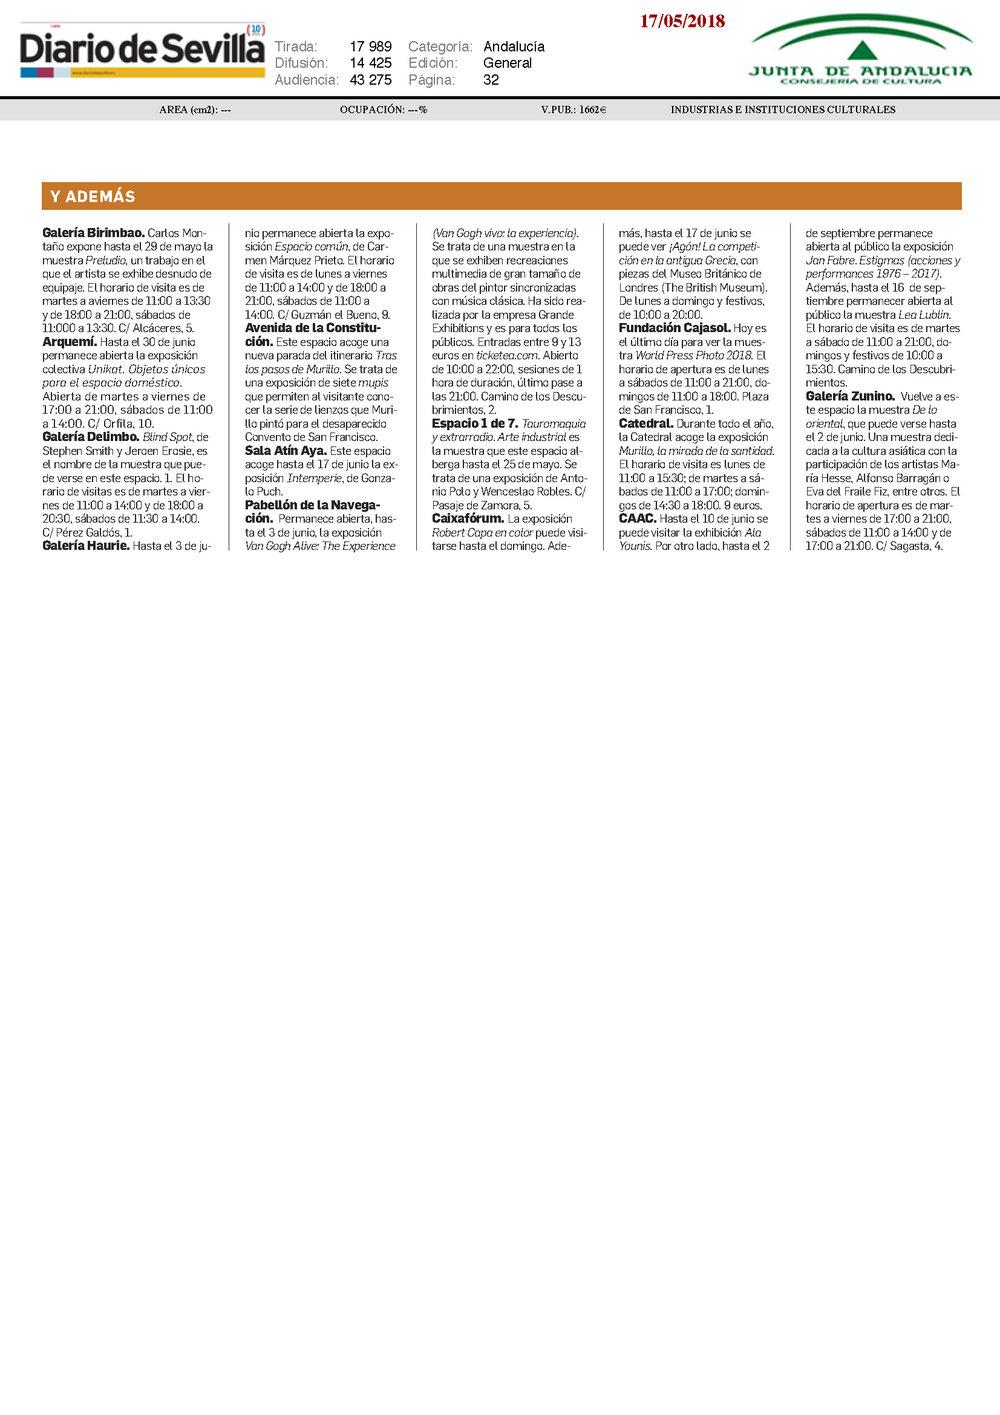 Dossier de Prensa_Page_15.jpg